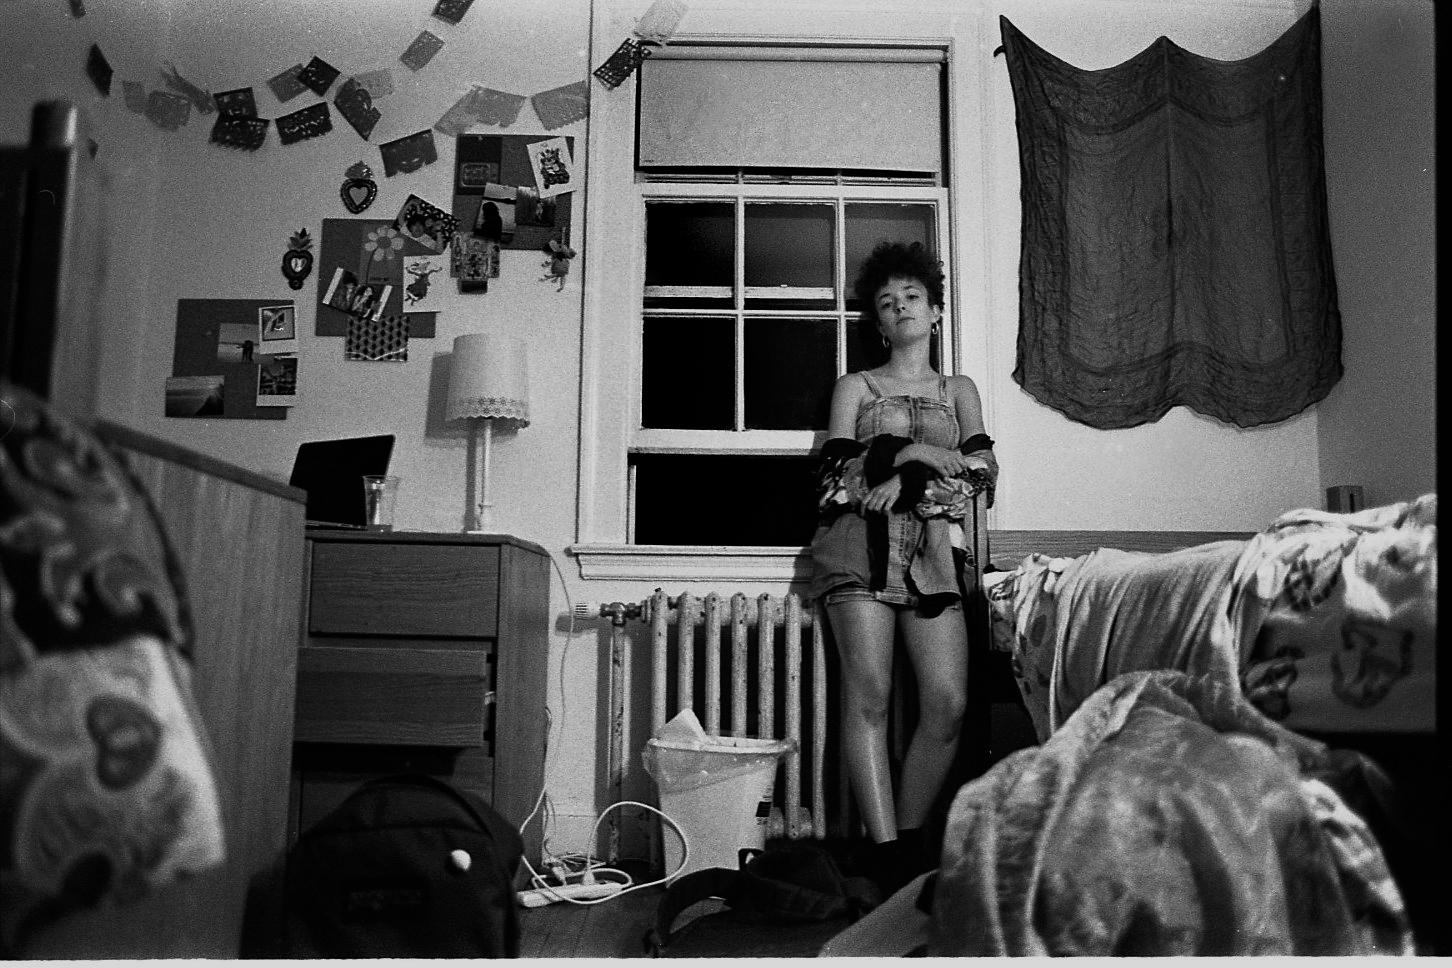 Odessa in her Room, 2015